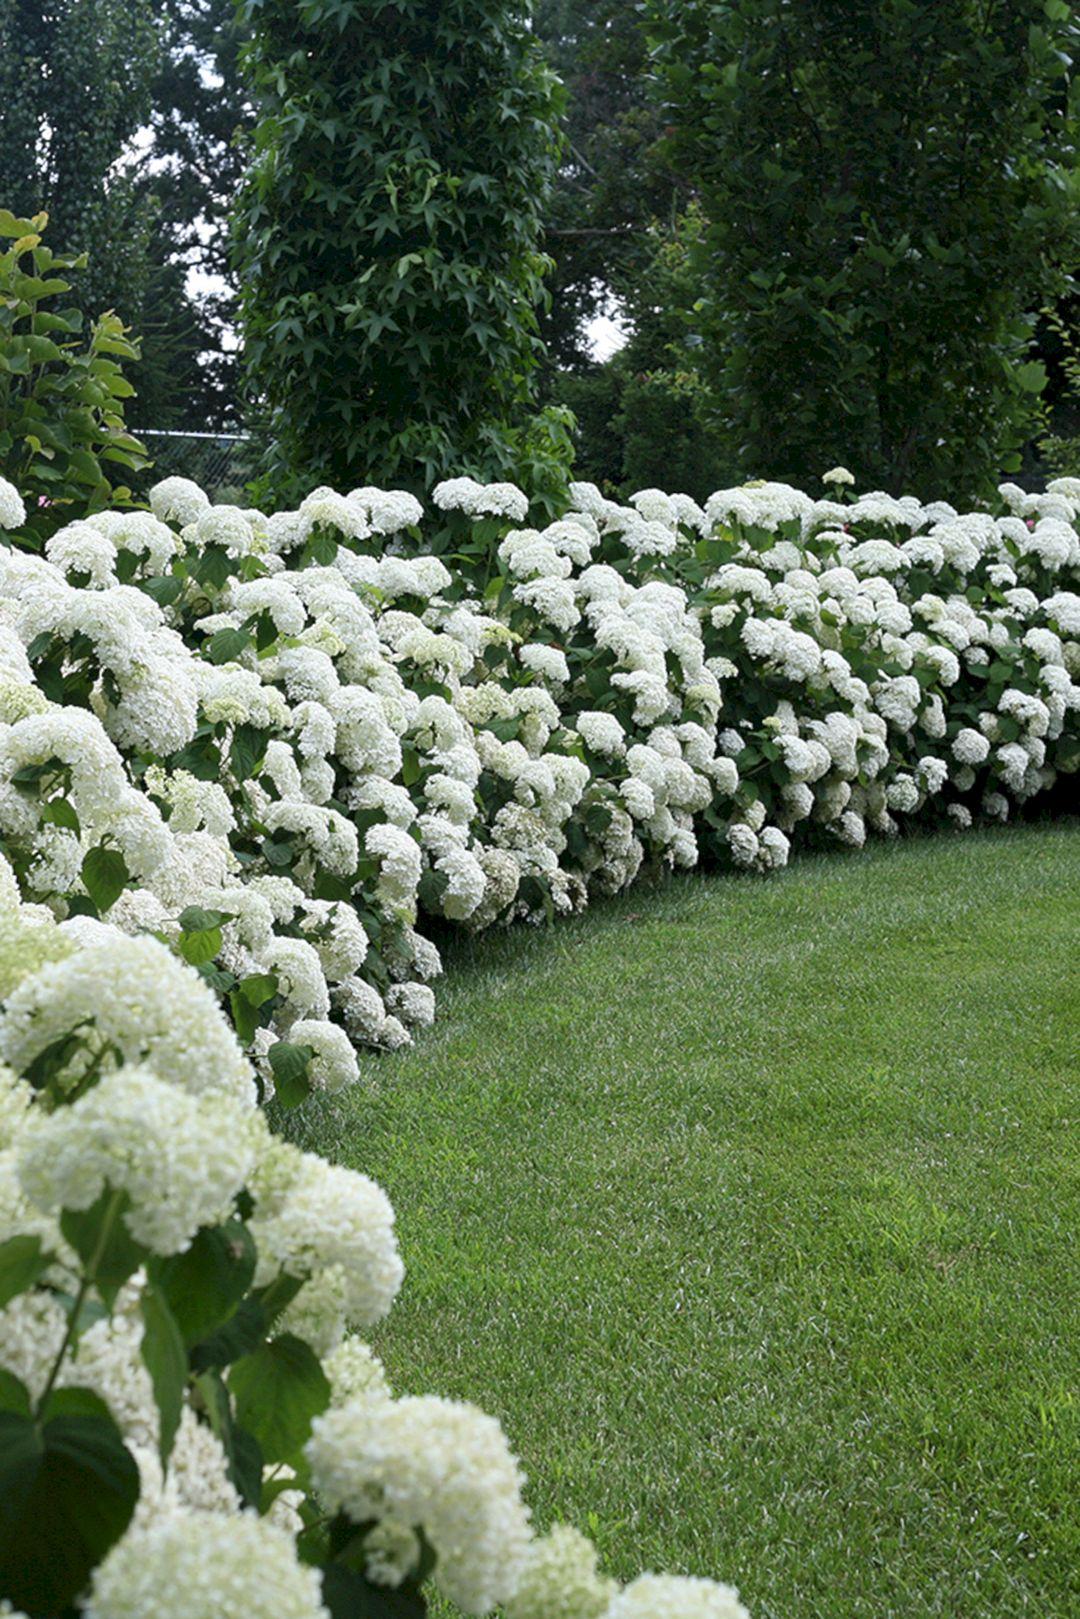 Designing a Garden With Landscape Design Principles 30 ...